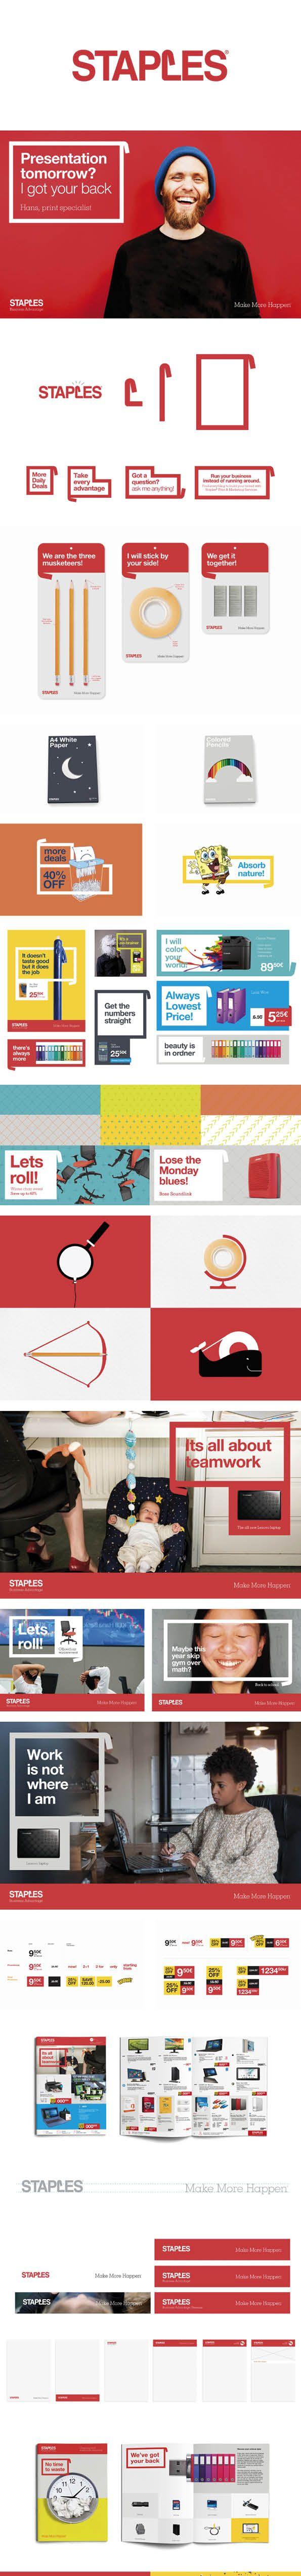 More corporate-designs are collected on: https://pinterest.com/rothenhaeusler/best-of-corporate-design/ · Client: Staples · Agency: koeweidenpostma #branding #identity #corporatedesign